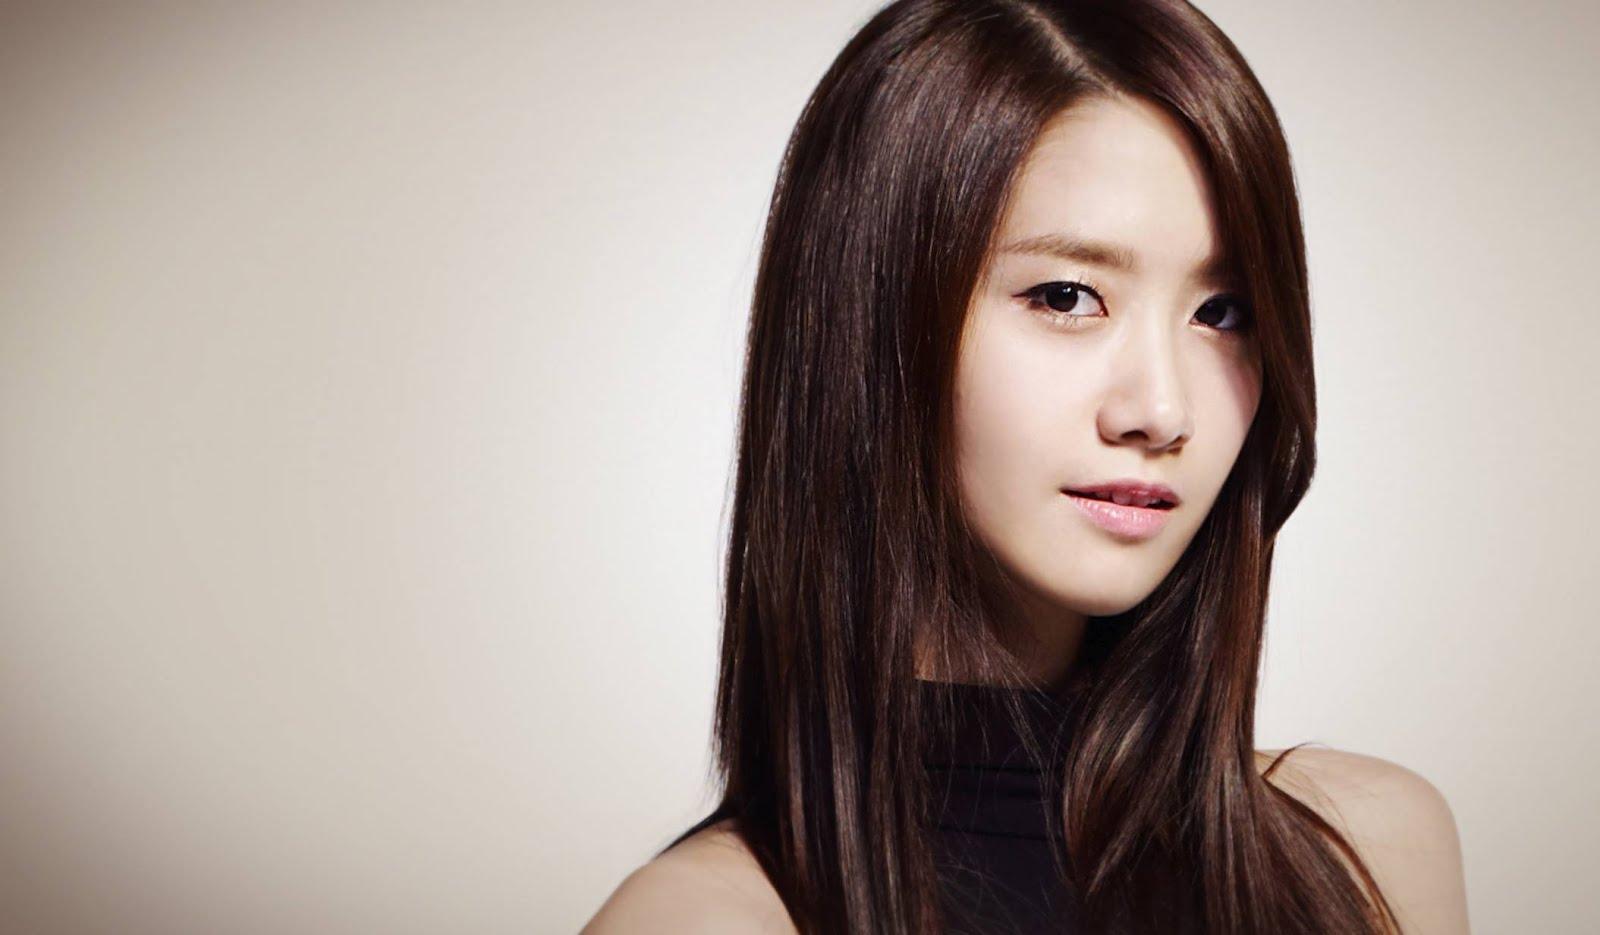 Gaya Model Rambut Cewek Korea